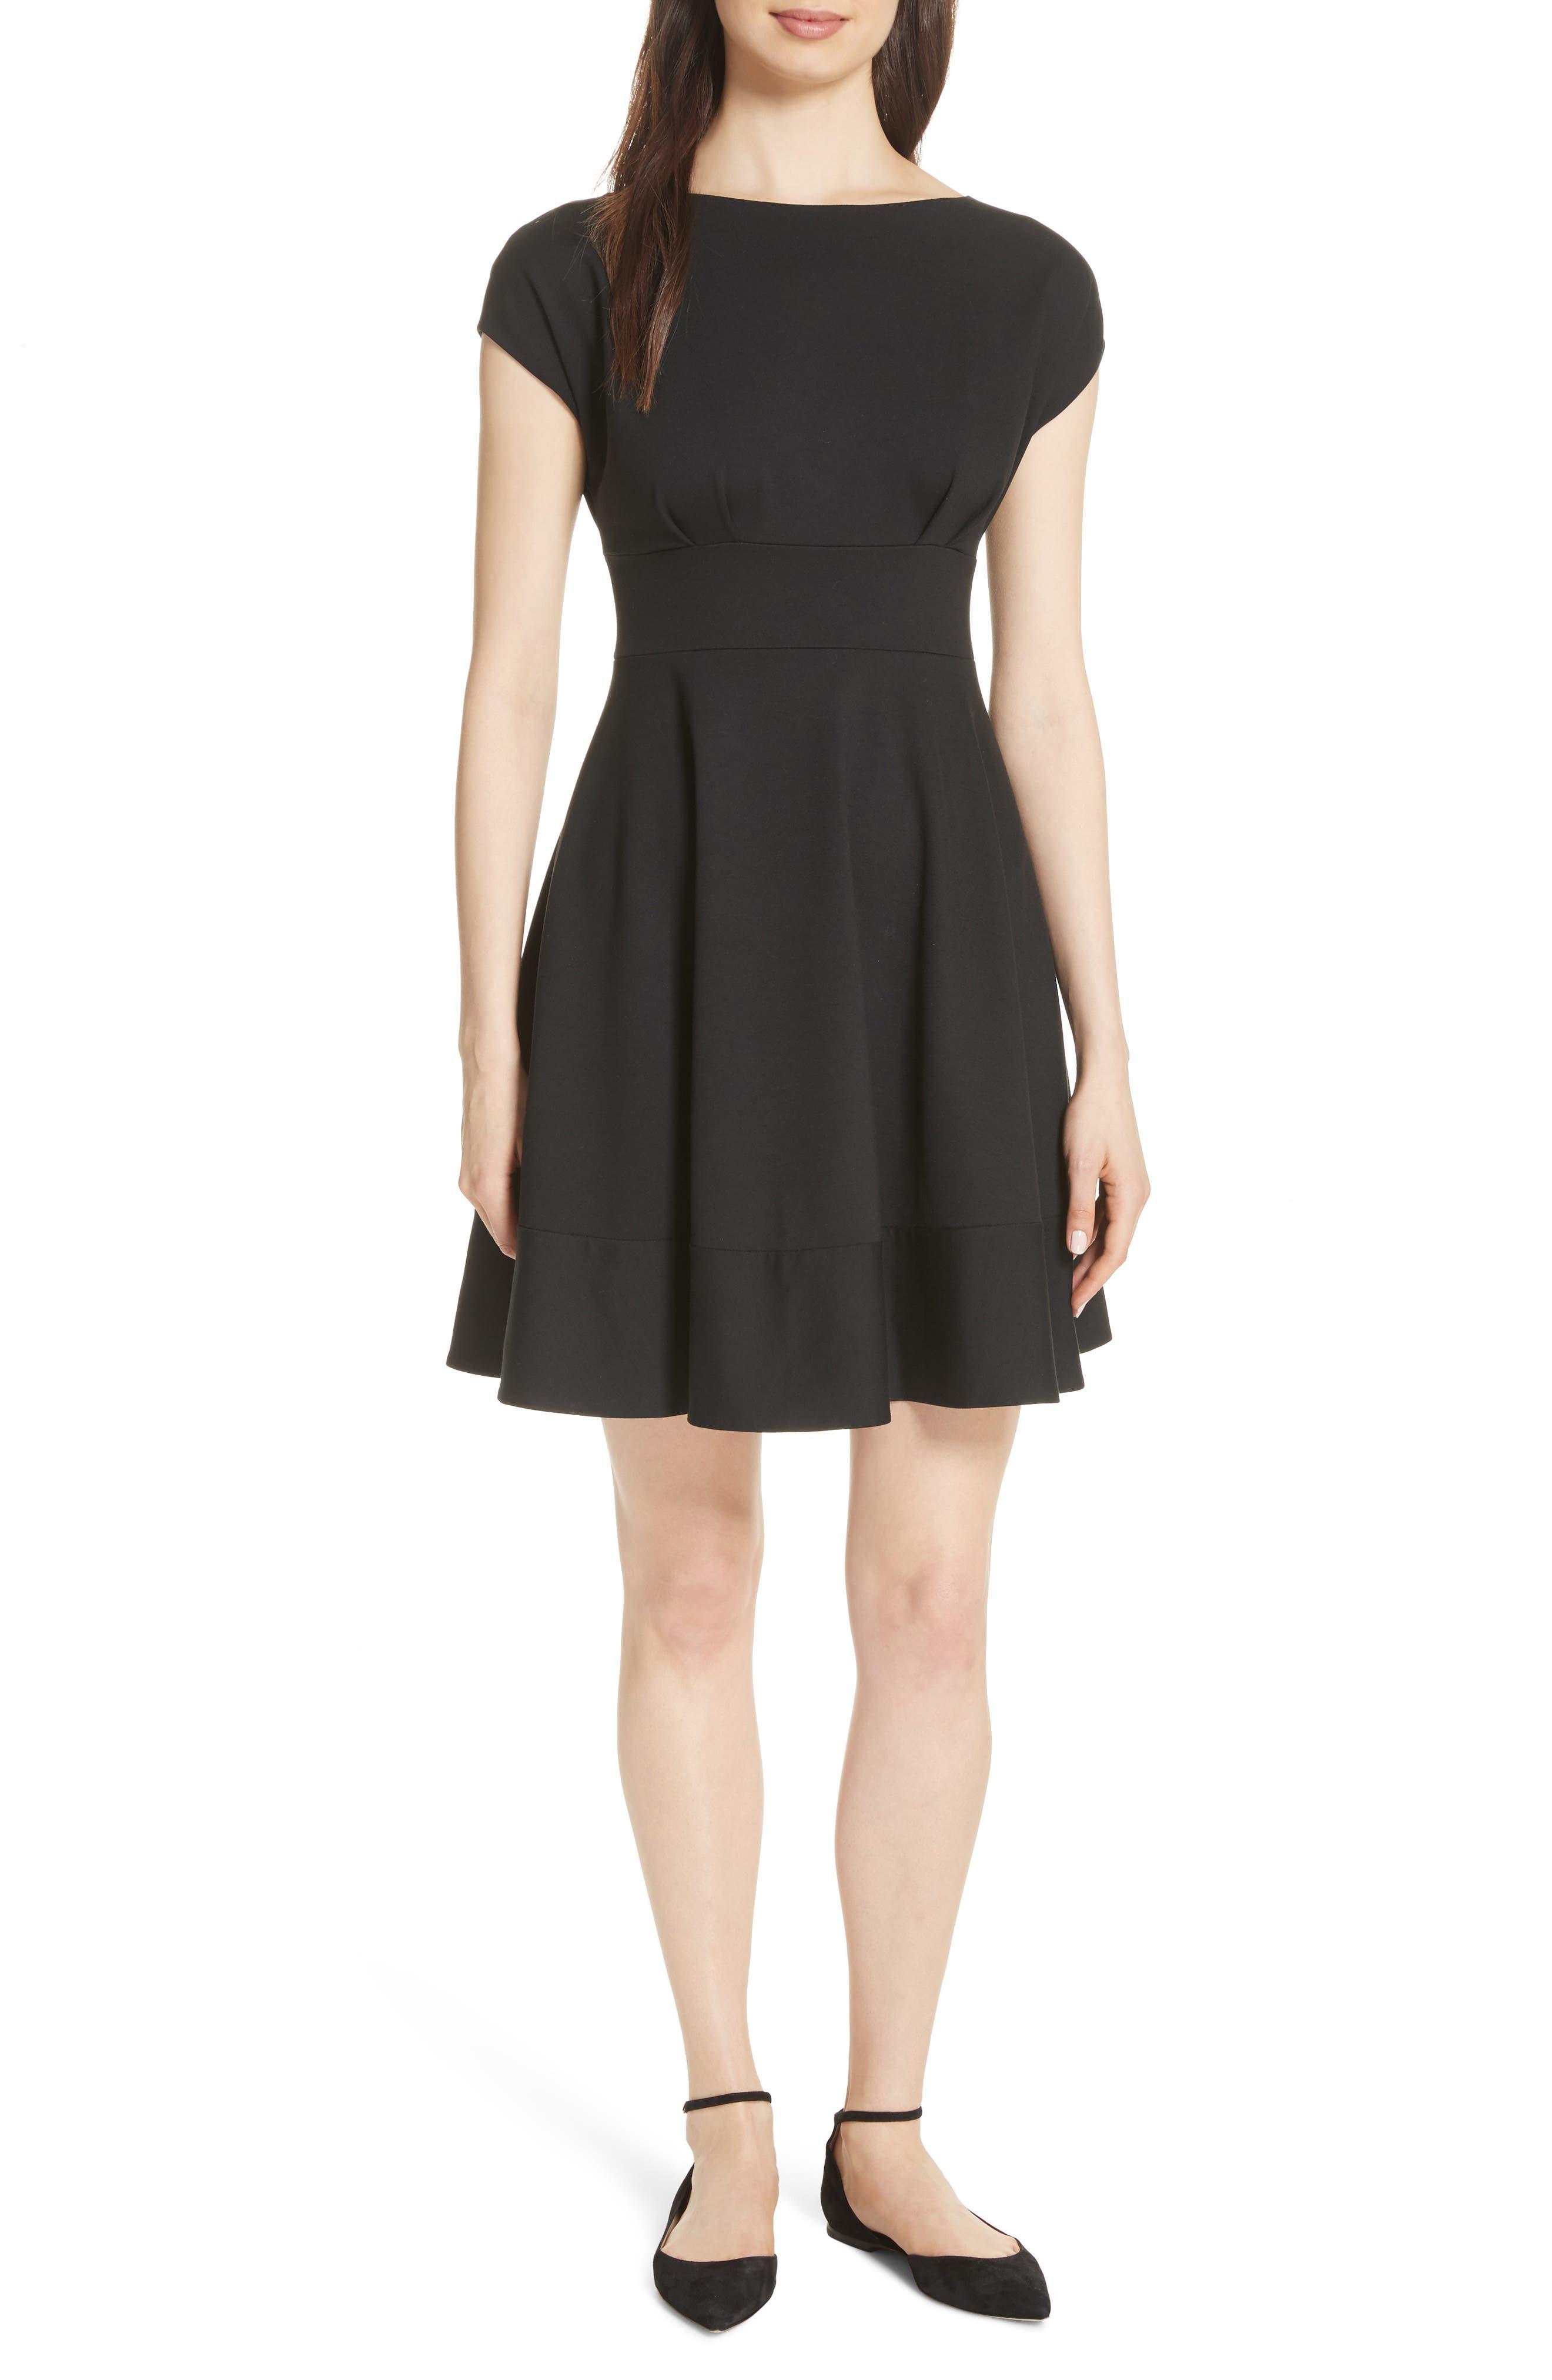 KATE SPADE NEW YORK,                             ponte fiorella fit & flare dress,                             Main thumbnail 1, color,                             BLACK